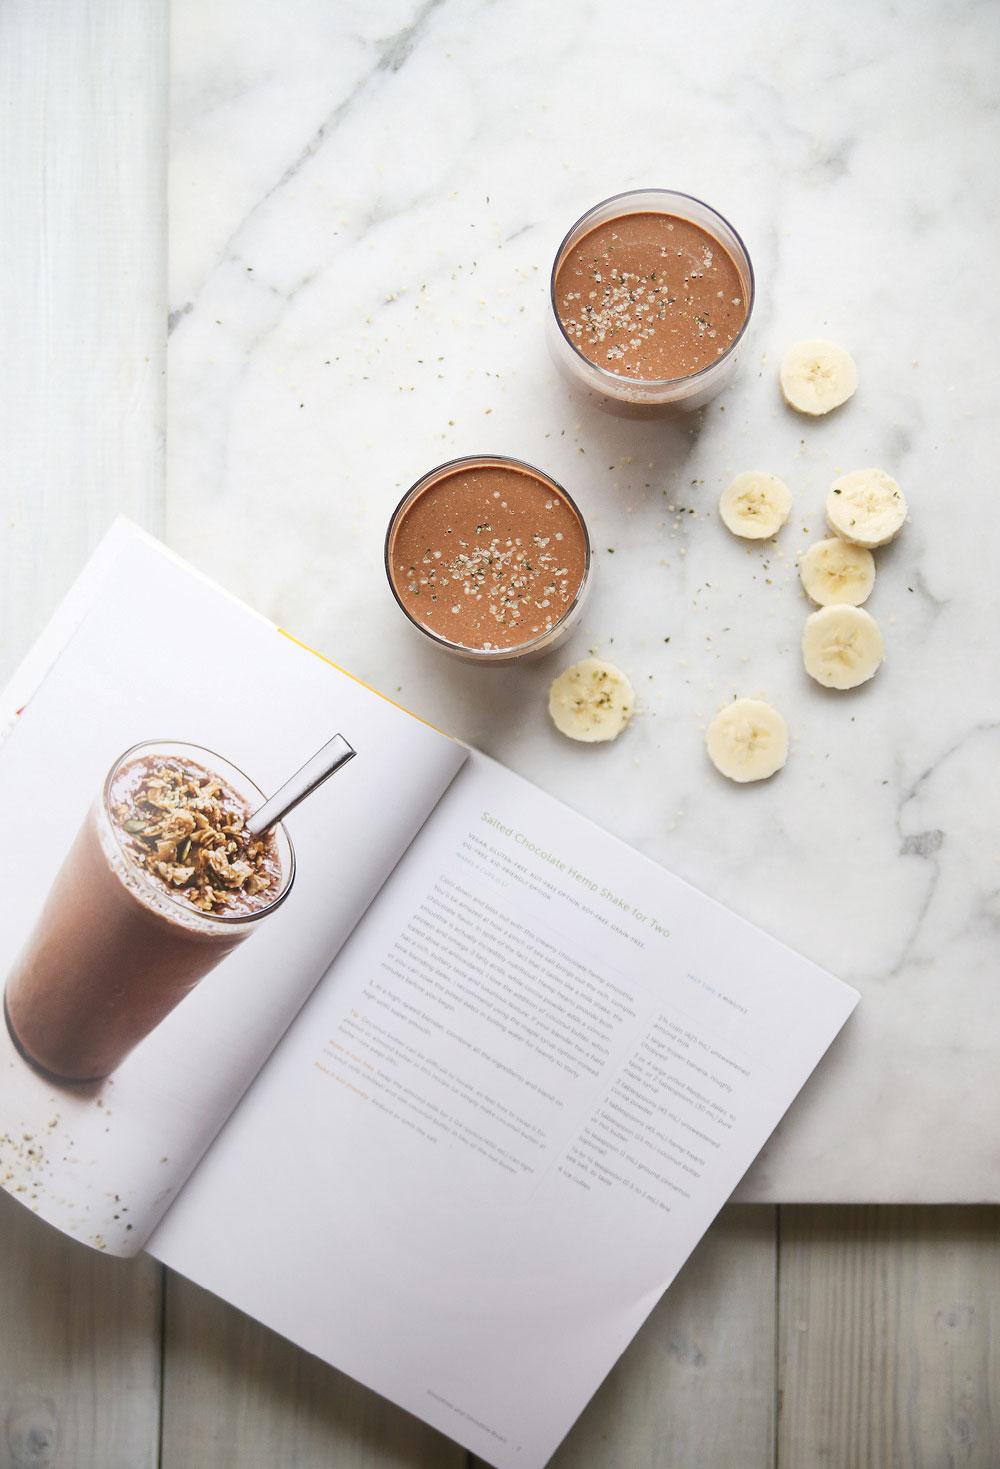 salted-chocolate-hemp-shake-smoothie-oh-she-glows-pure-ella-leche6